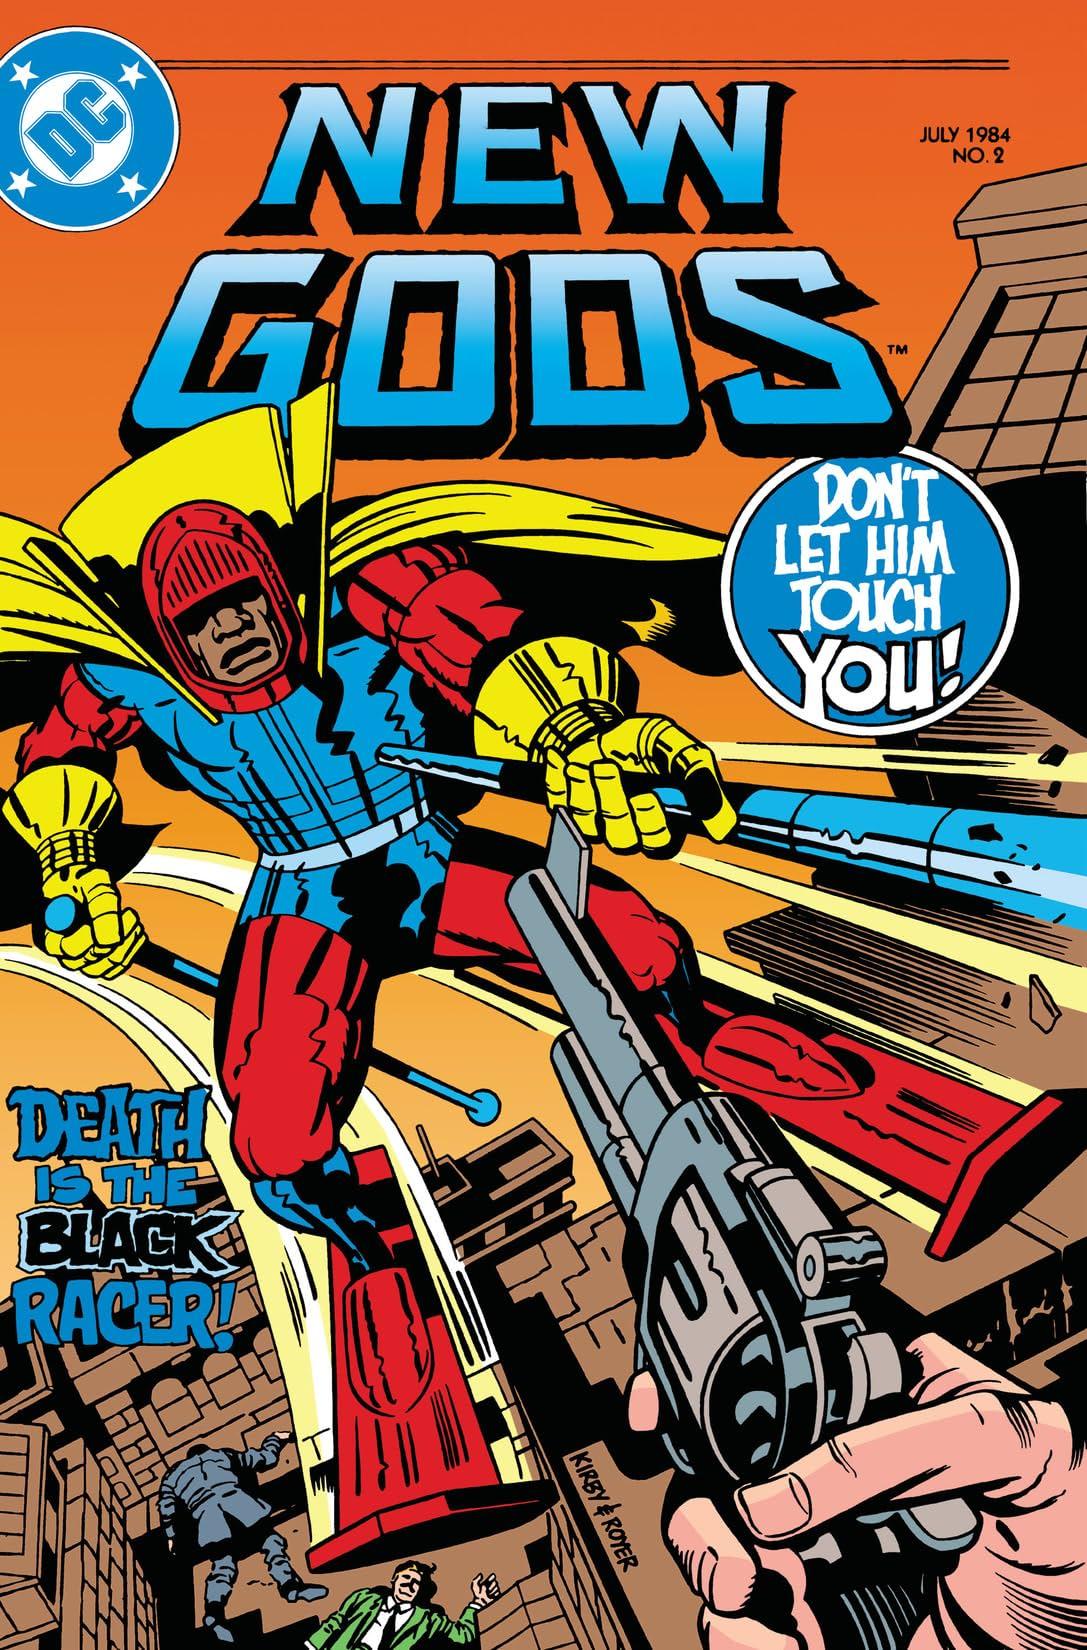 New Gods (1984) #2